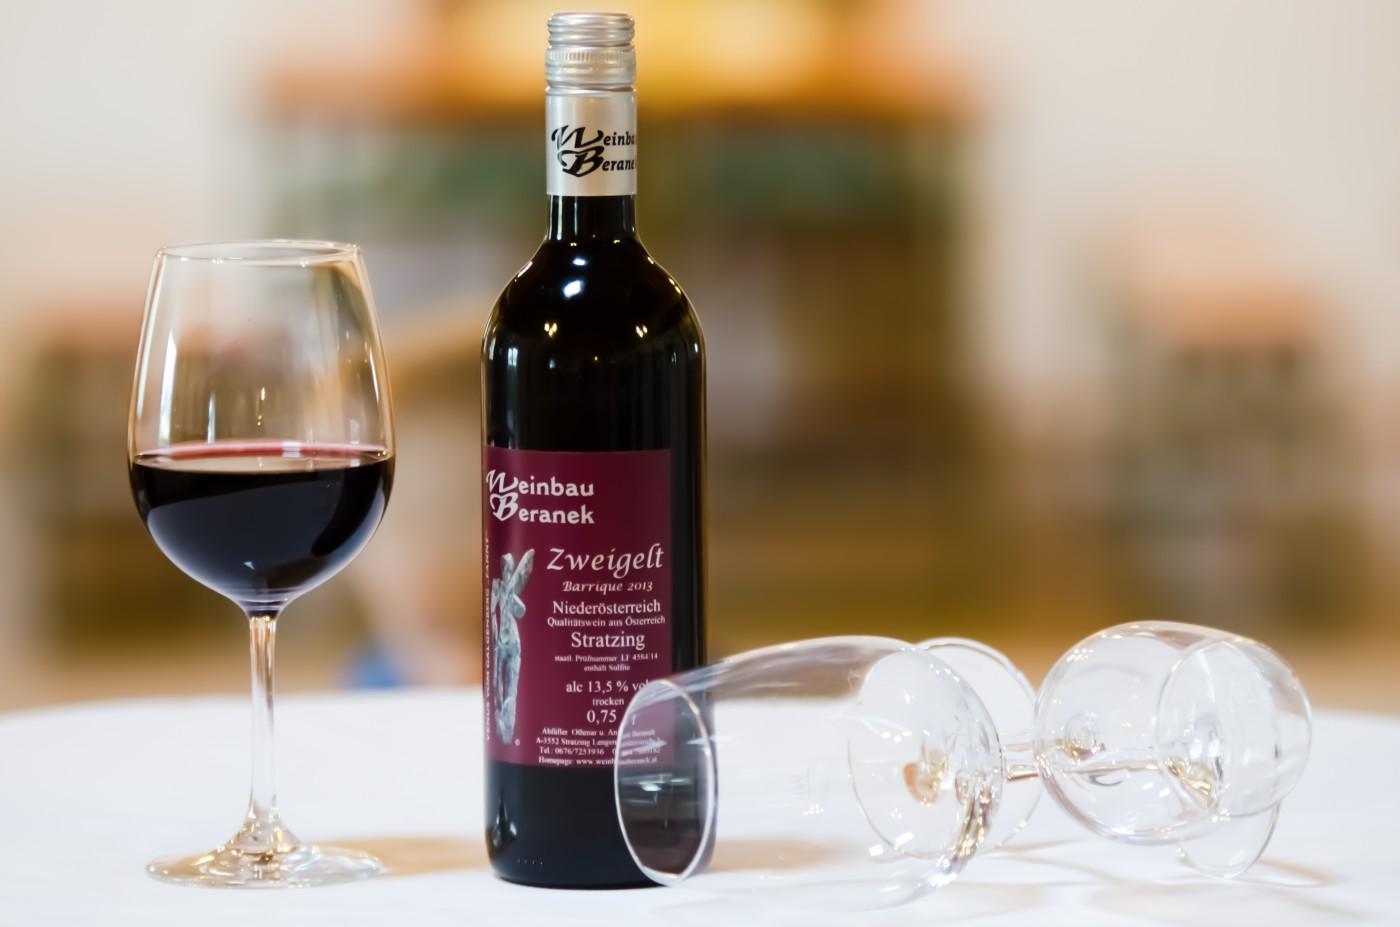 Zweigelt Barrique 2013 - Weinbau Beranek